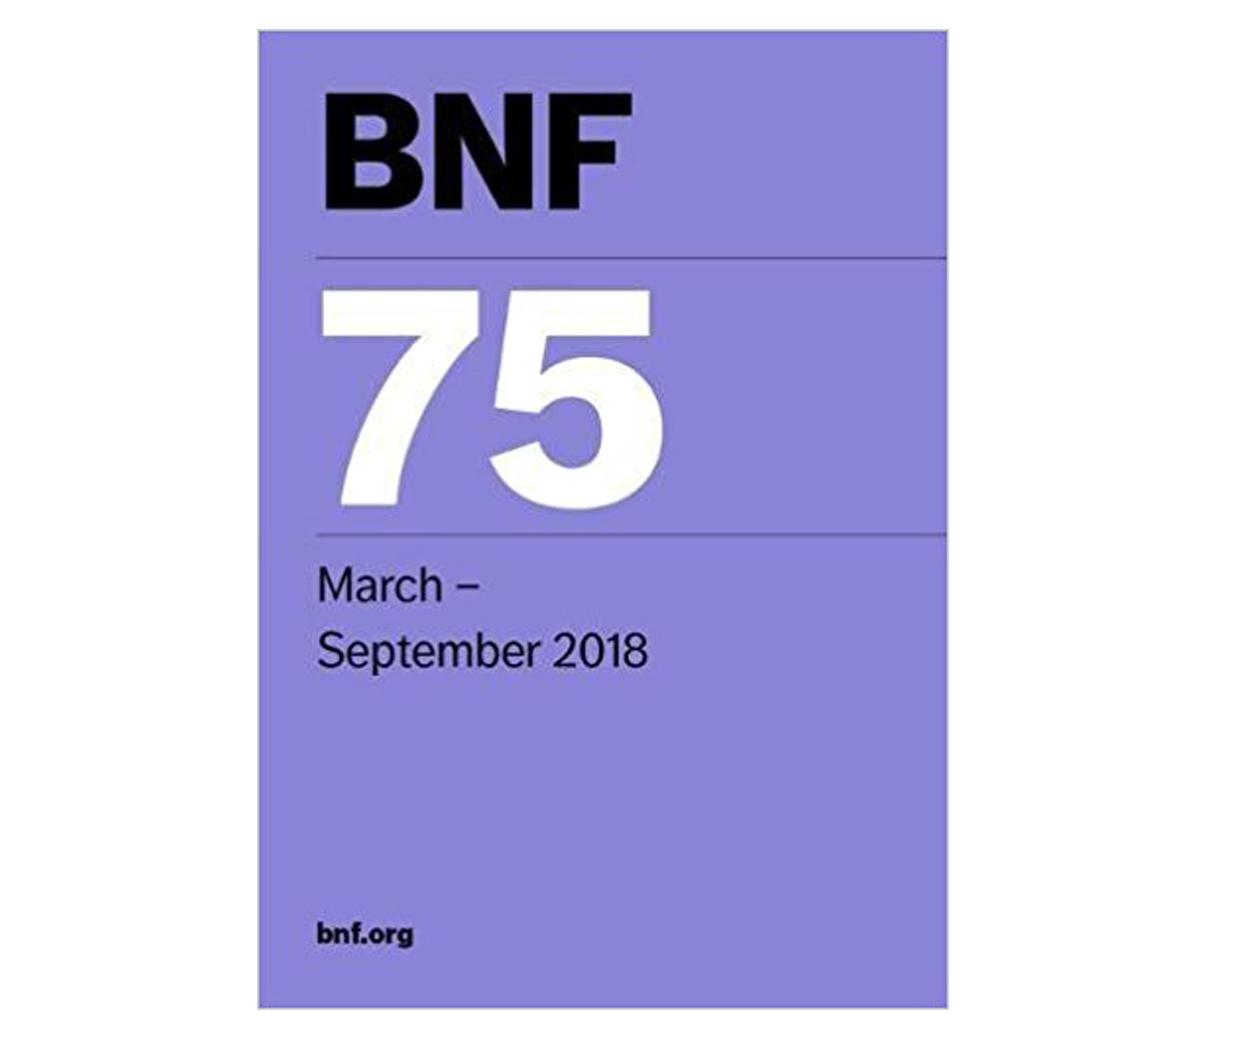 BNF 75 (British National Formulary)